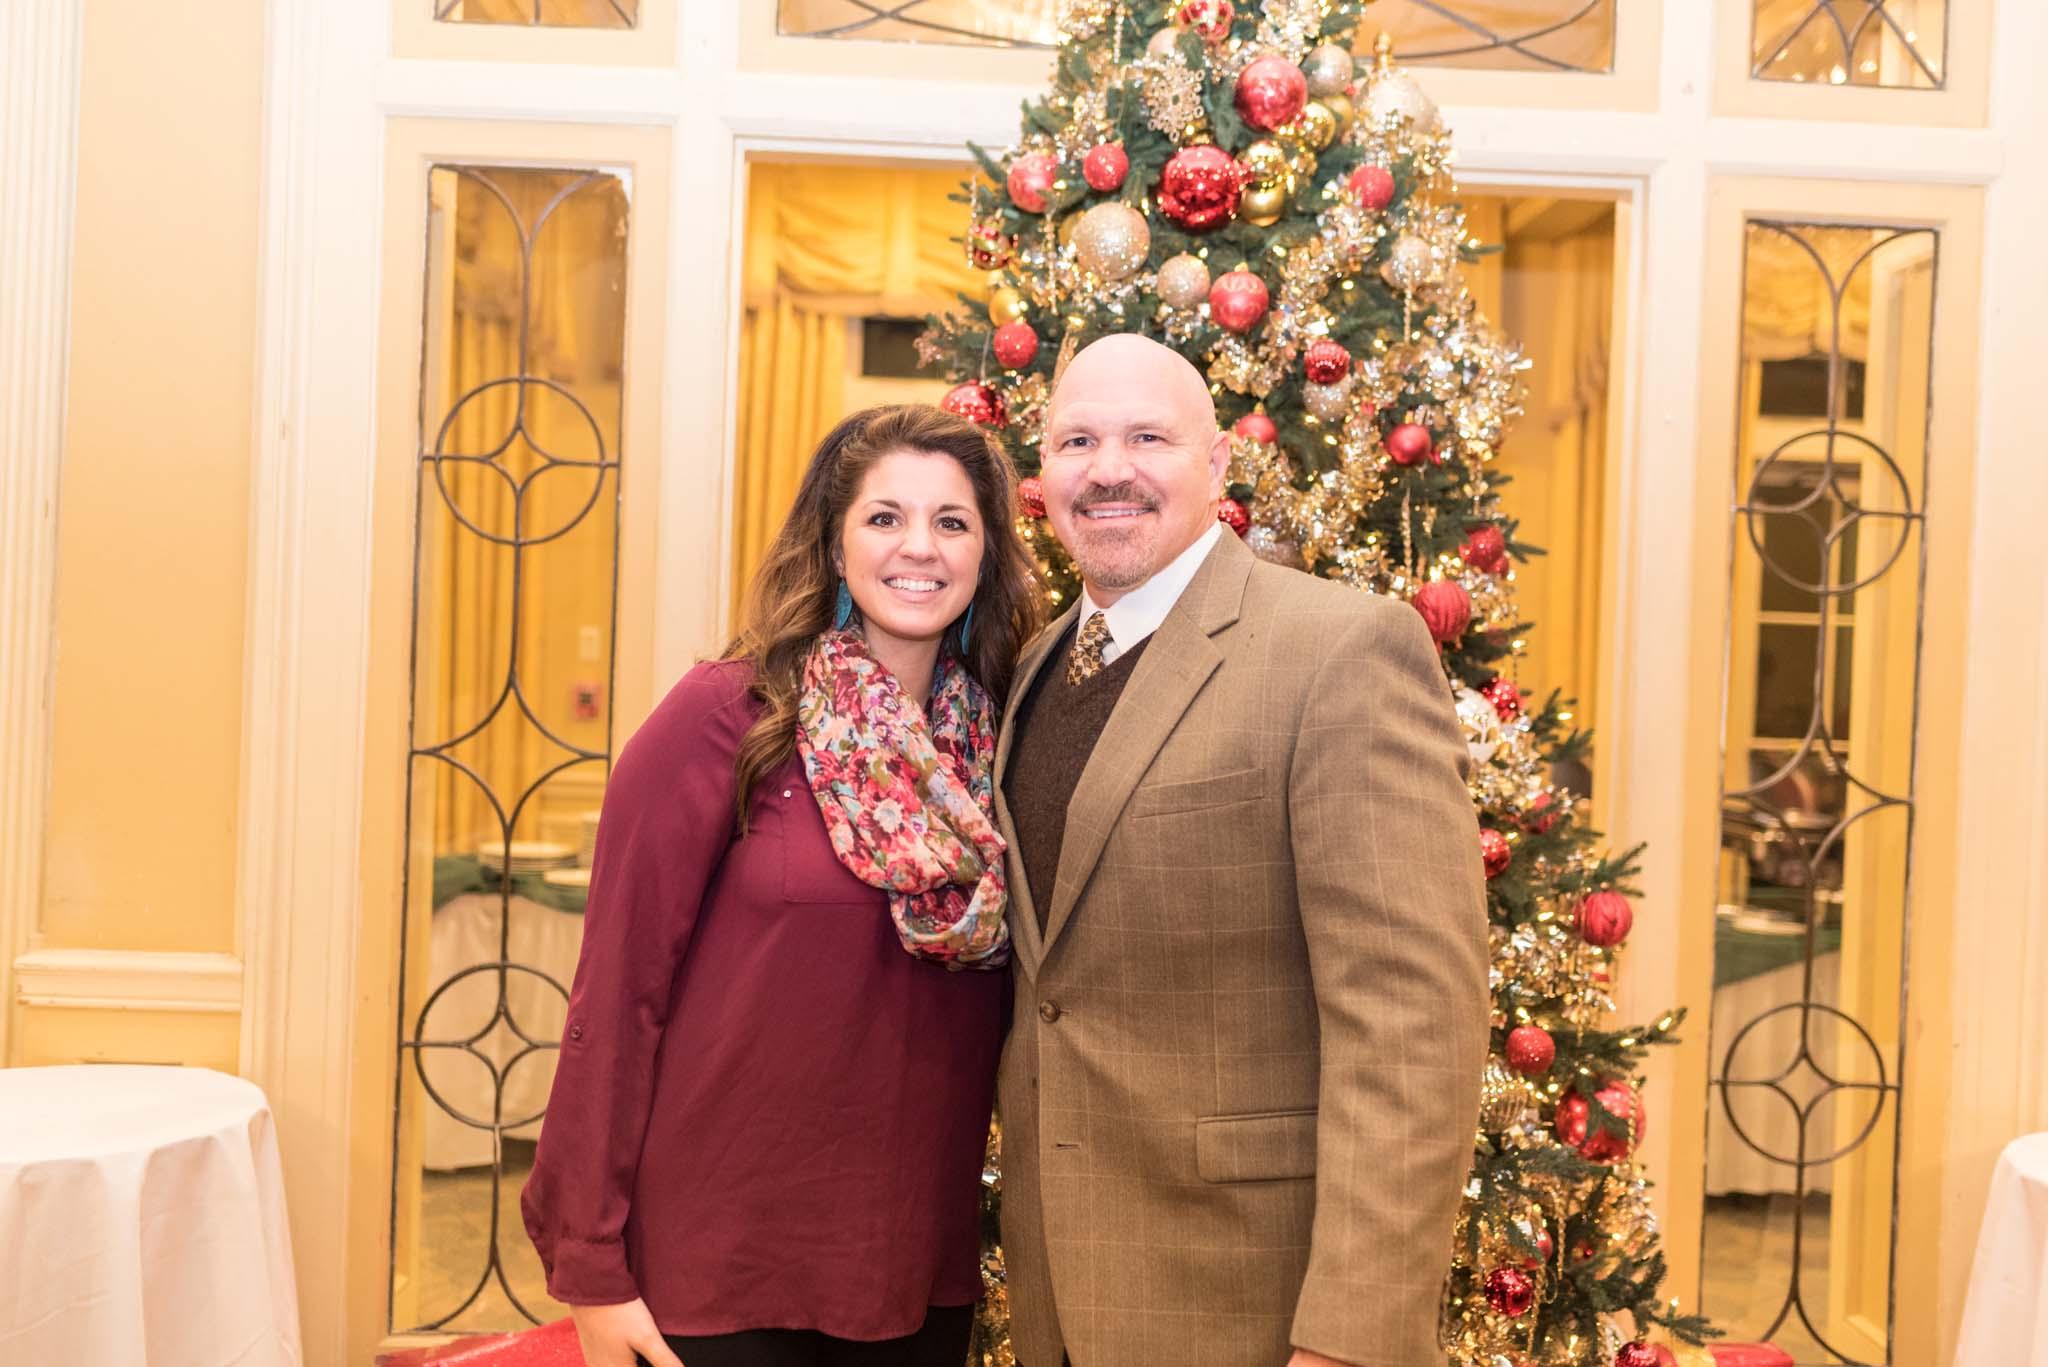 Sarah Schreve and Pastor Jeff Schreve